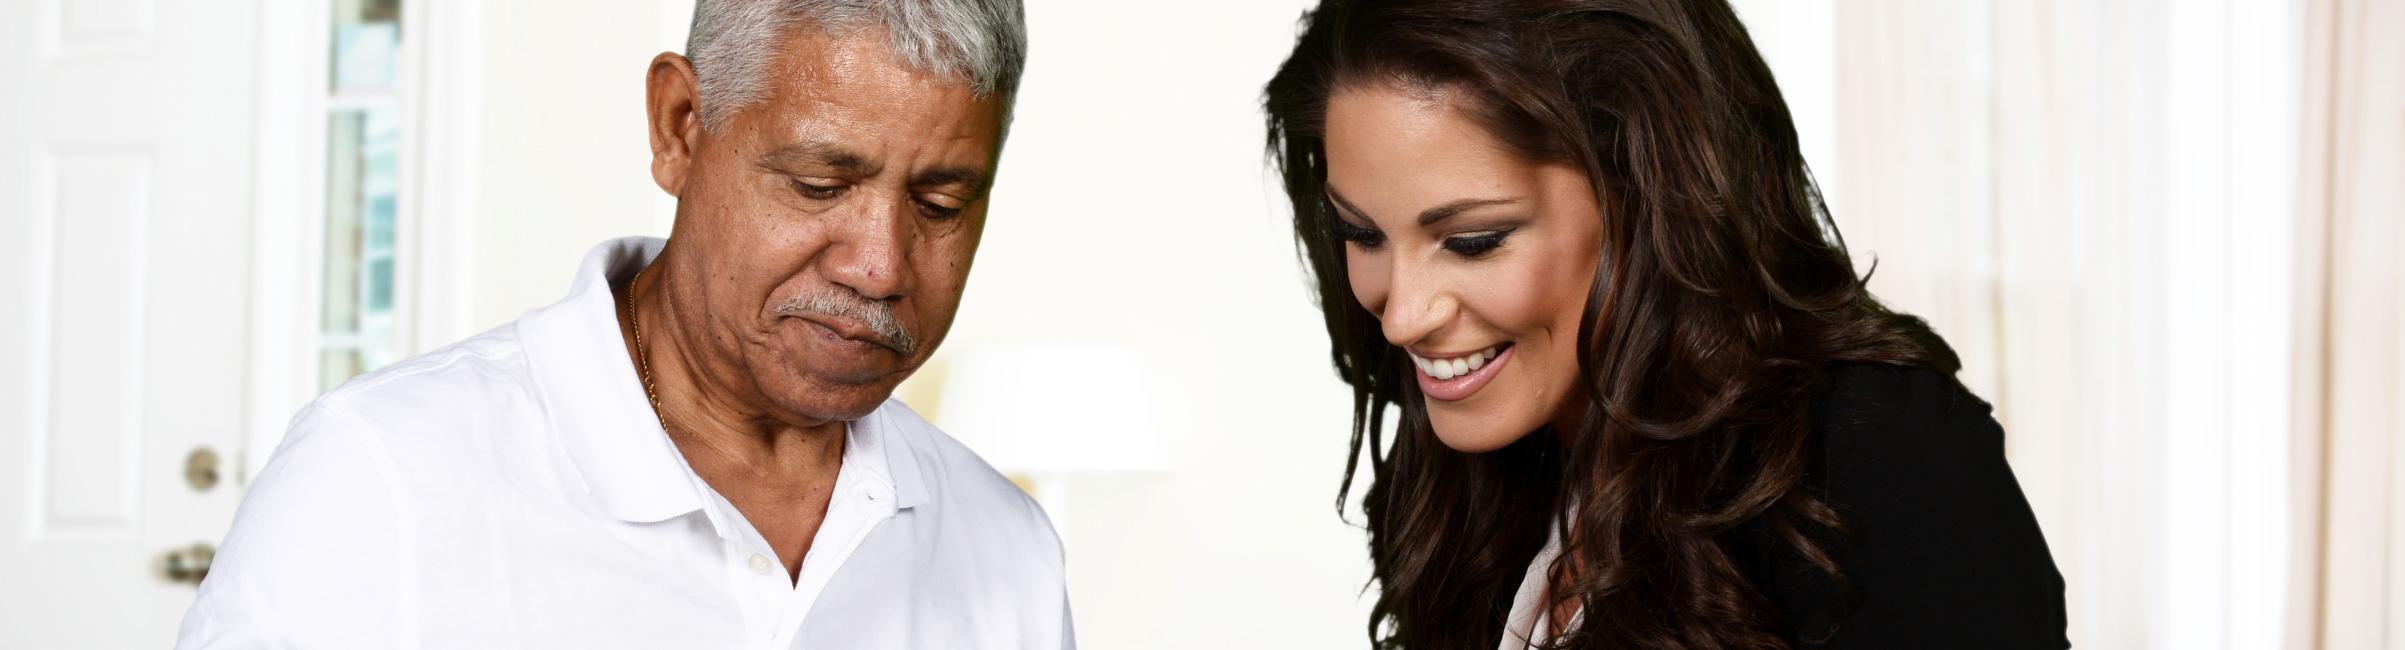 Elderly man talking his caregiver